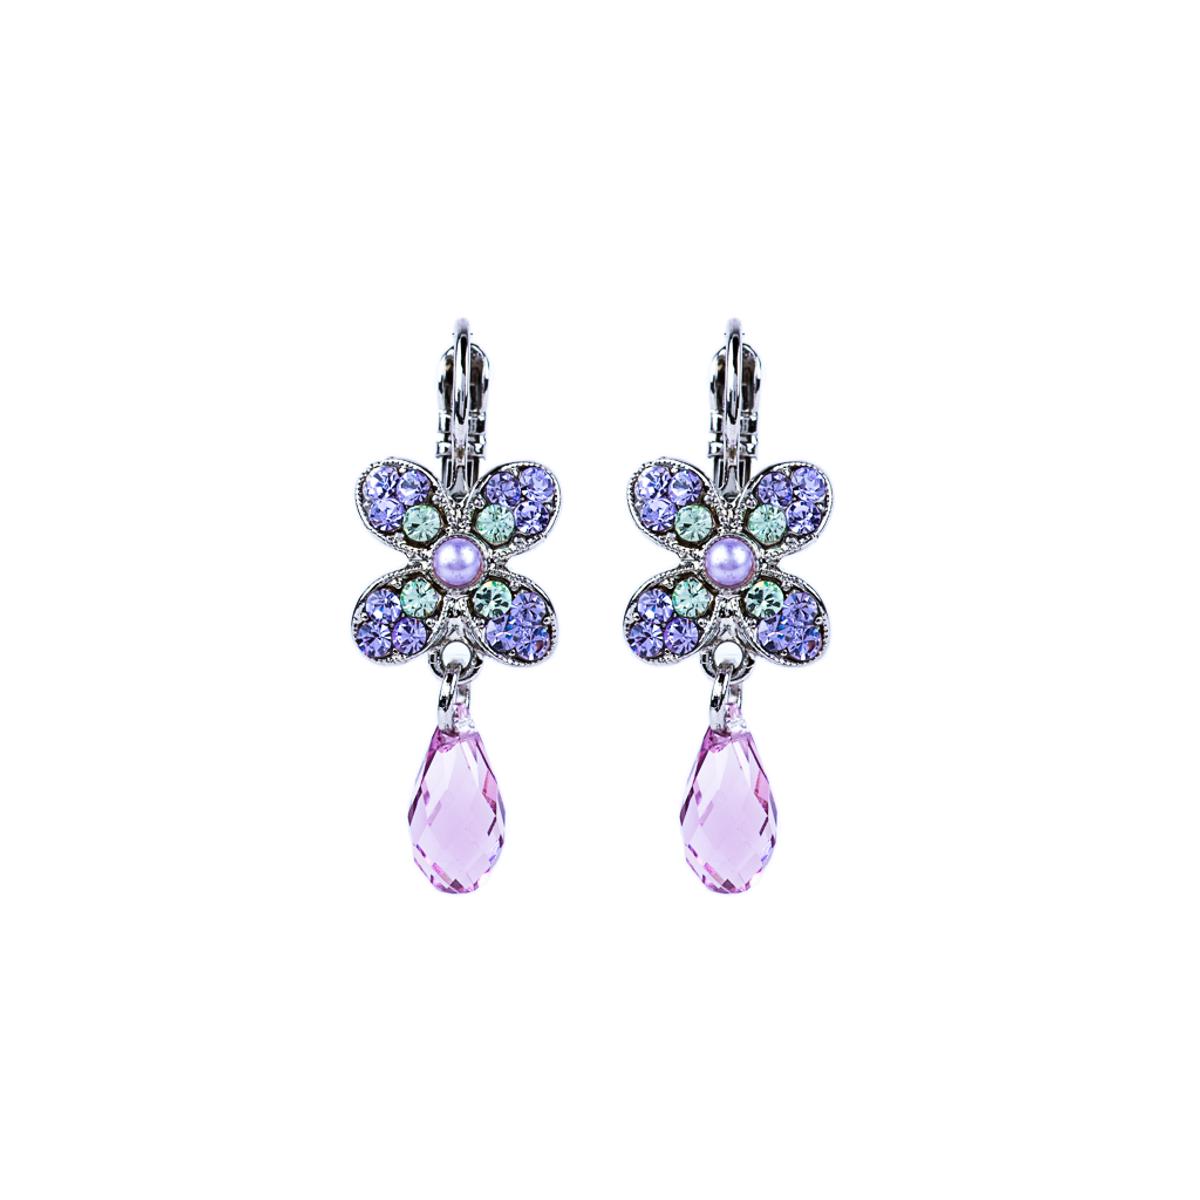 Mariana Wallflower Leverback Earrings in Matcha